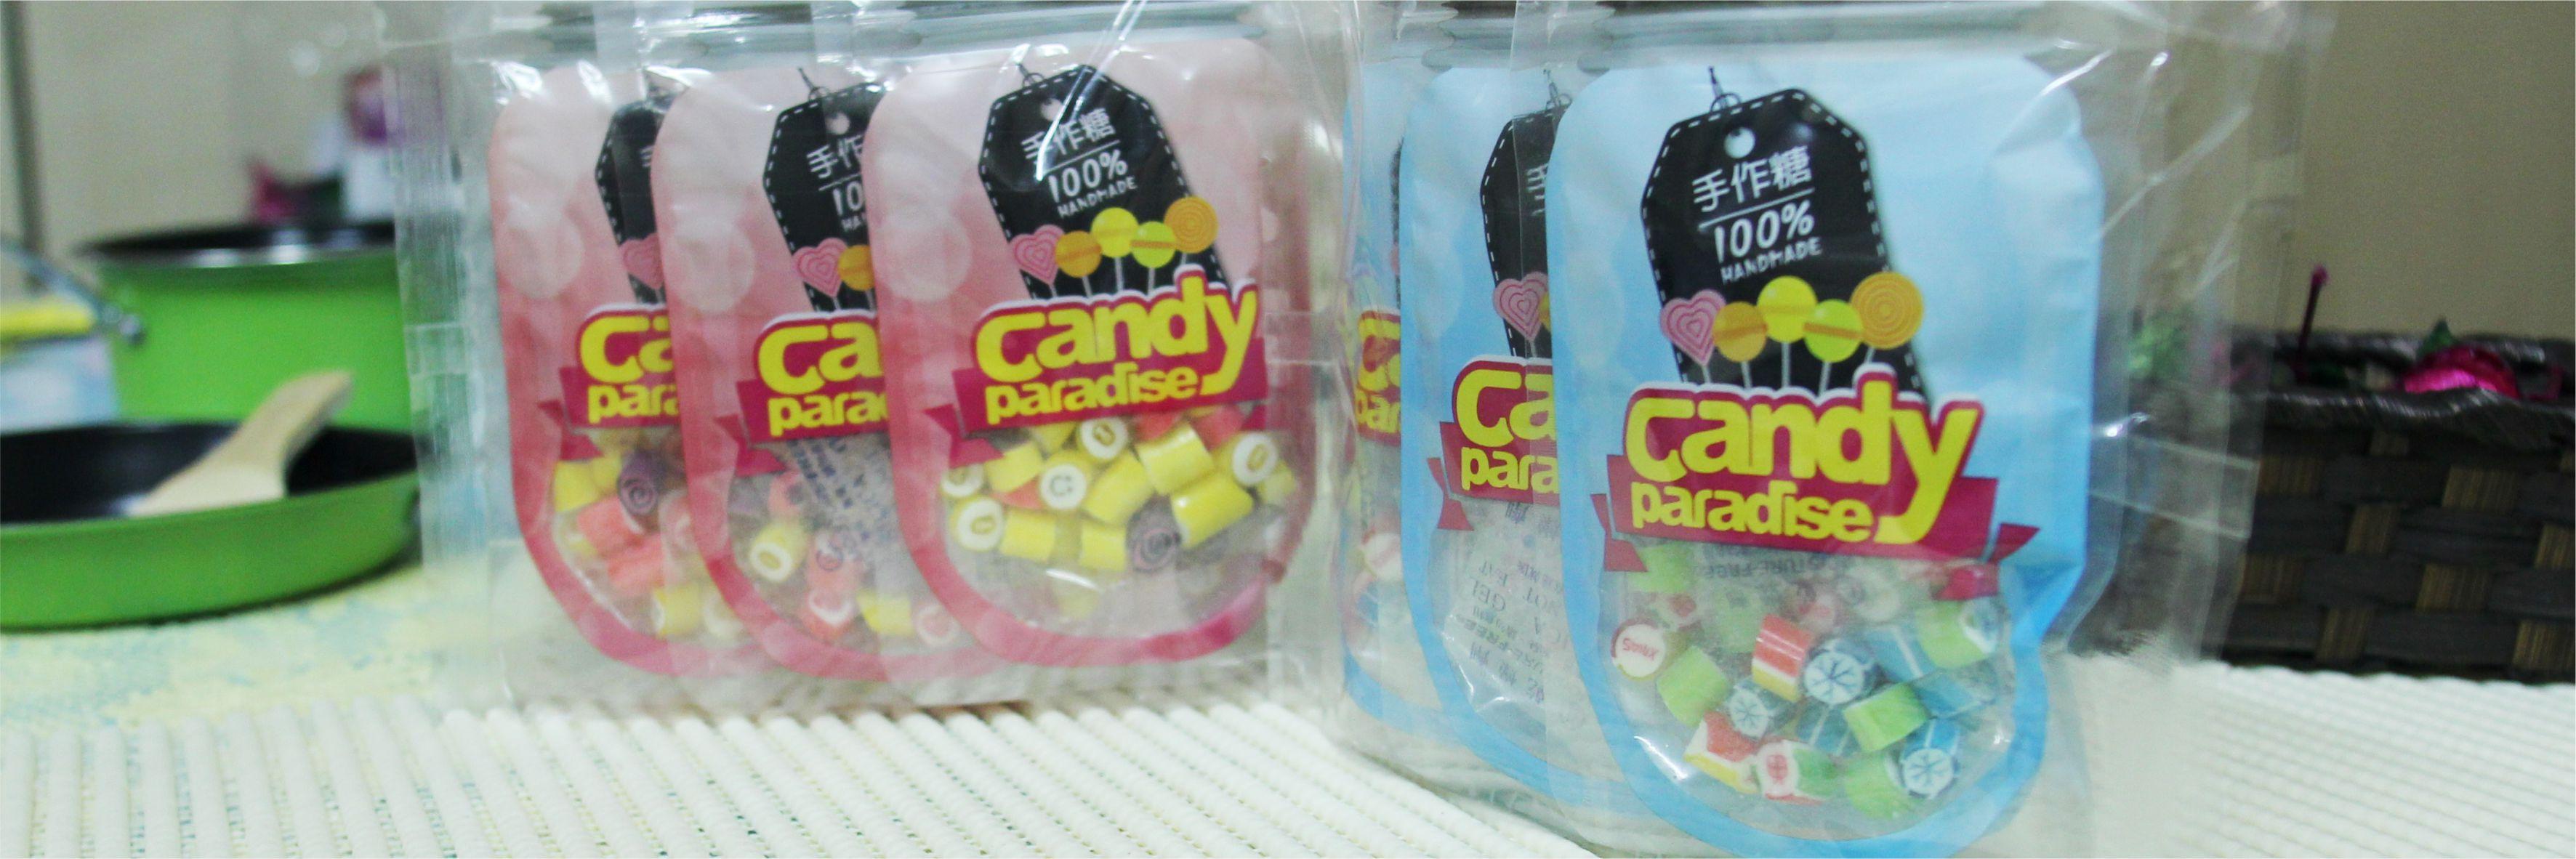 【KTmiss】Candy paradise繽紛手作糖(綜合口味)(3包入) 西班牙手工糖 西班牙手作糖 必買伴手禮 世界知名 好吃 便宜 團購 進口糖果 熱門 熱賣 超人氣 兒童 小朋友最愛